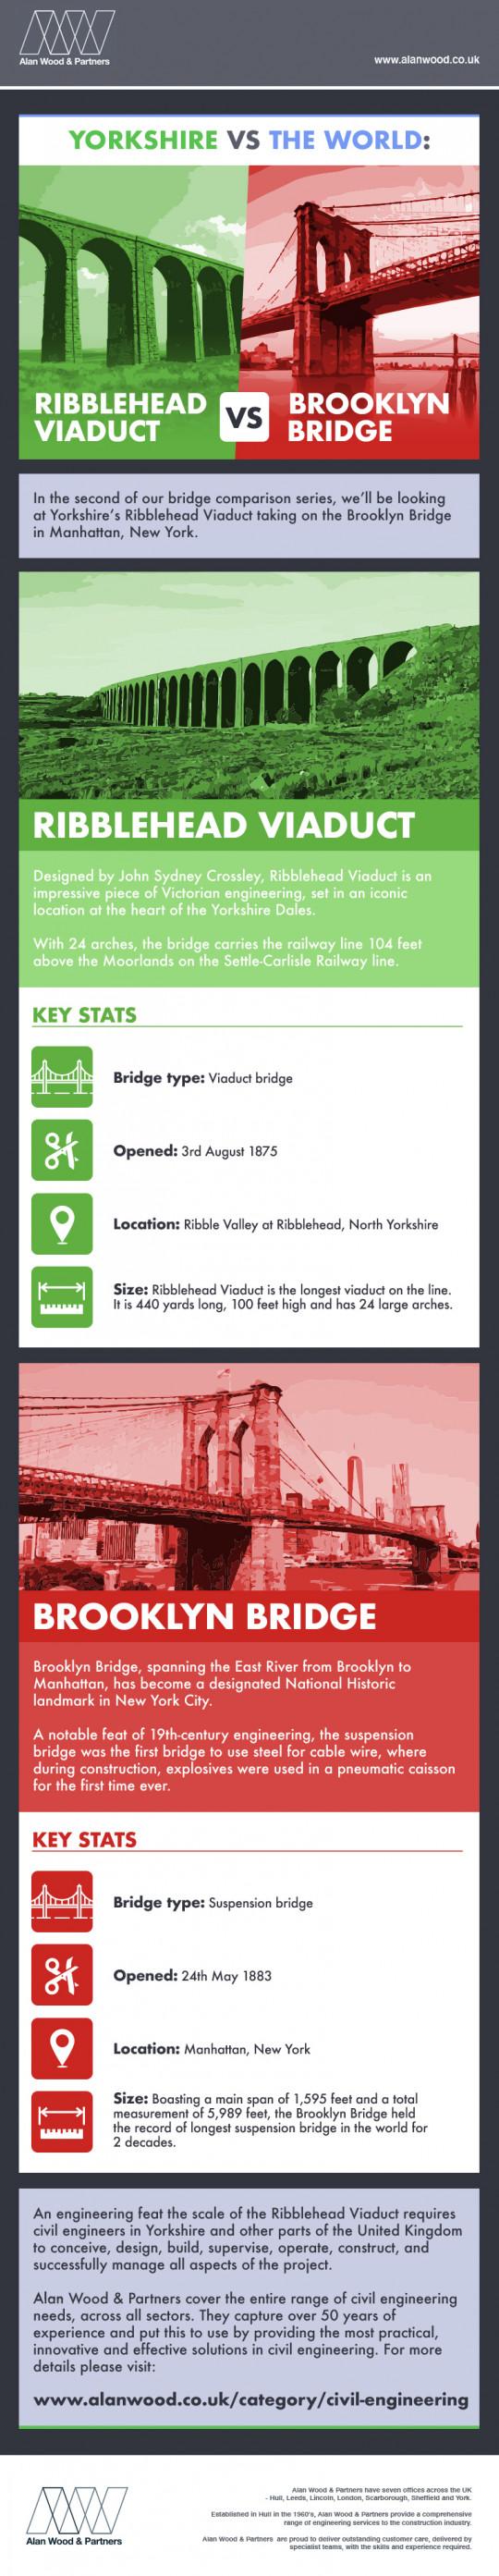 Ribblehead Viaduct vs Brooklyn Bridge